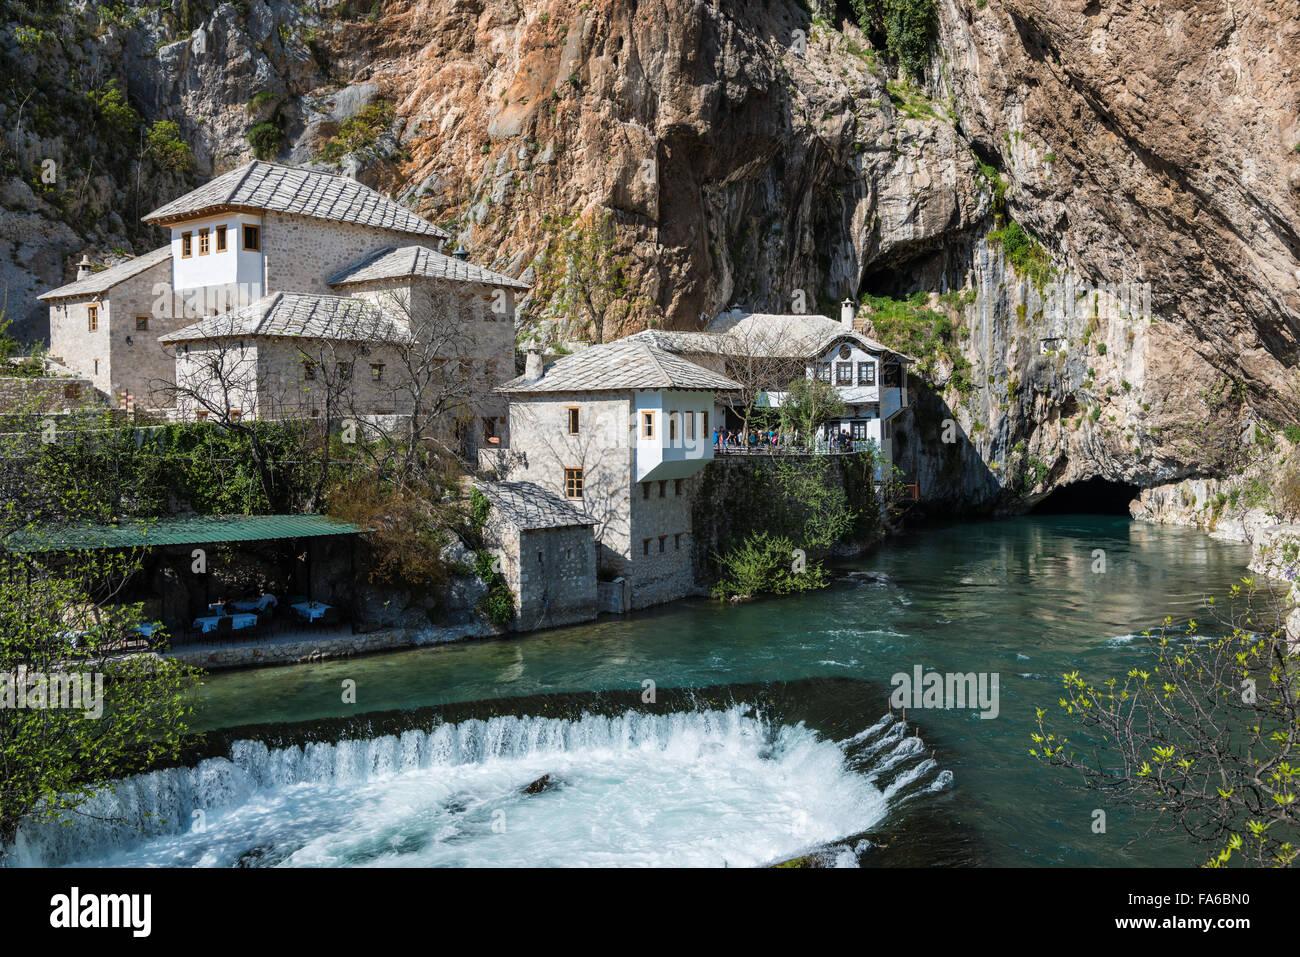 The Blagaj Tekke, a historical Dervish monastery, in Blagaj, Bosnia and Herzegovina. - Stock Image